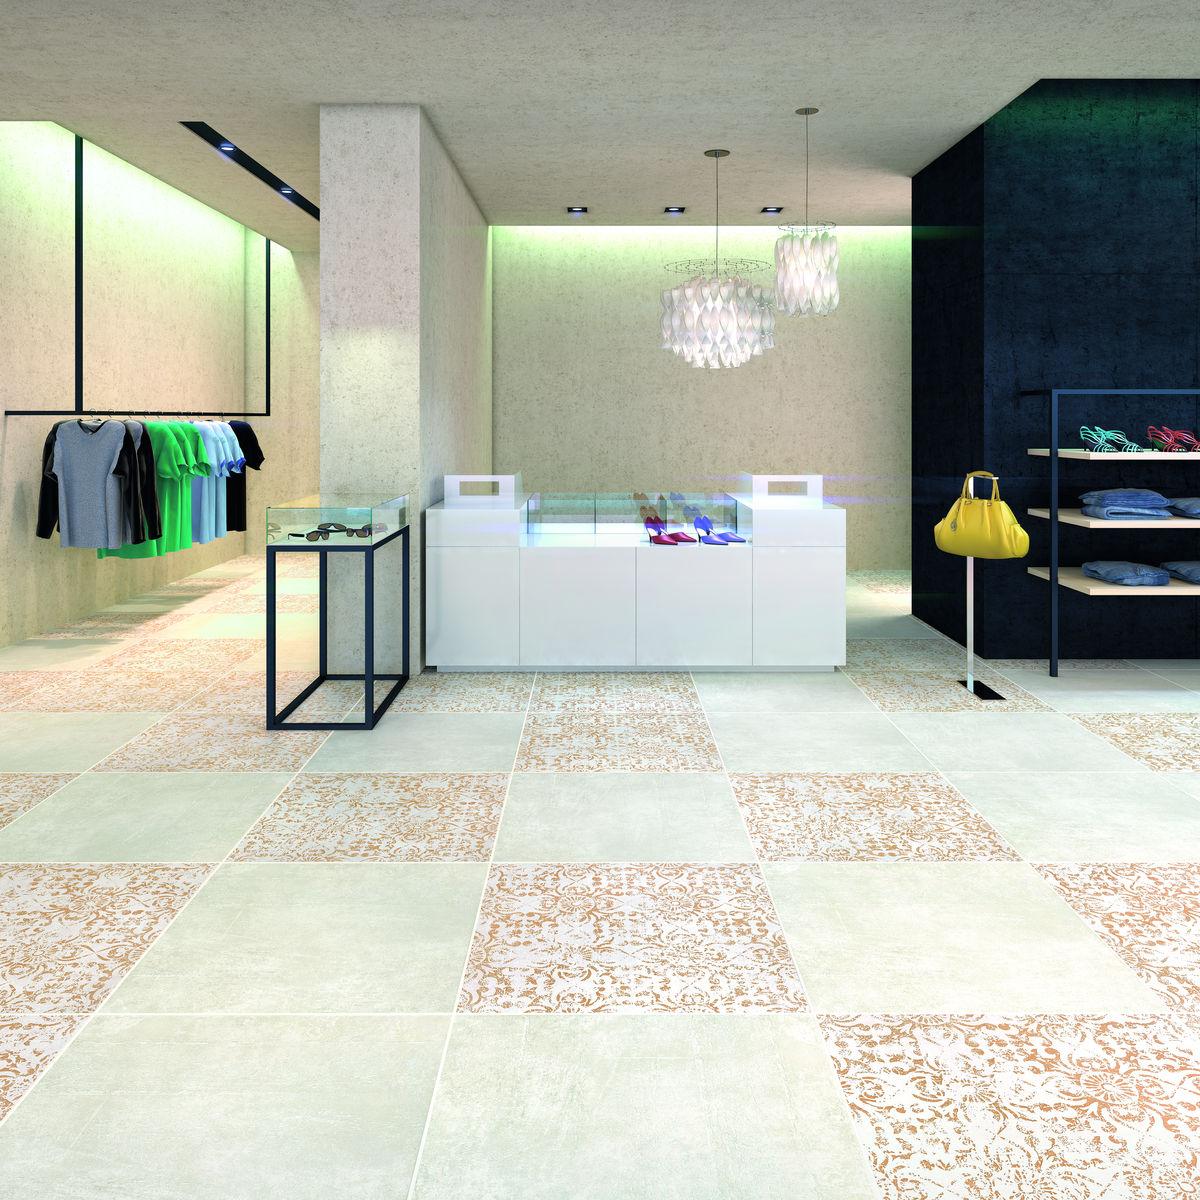 Декор Cemento Bianco 60x60 (zrxf1d) изображение 1